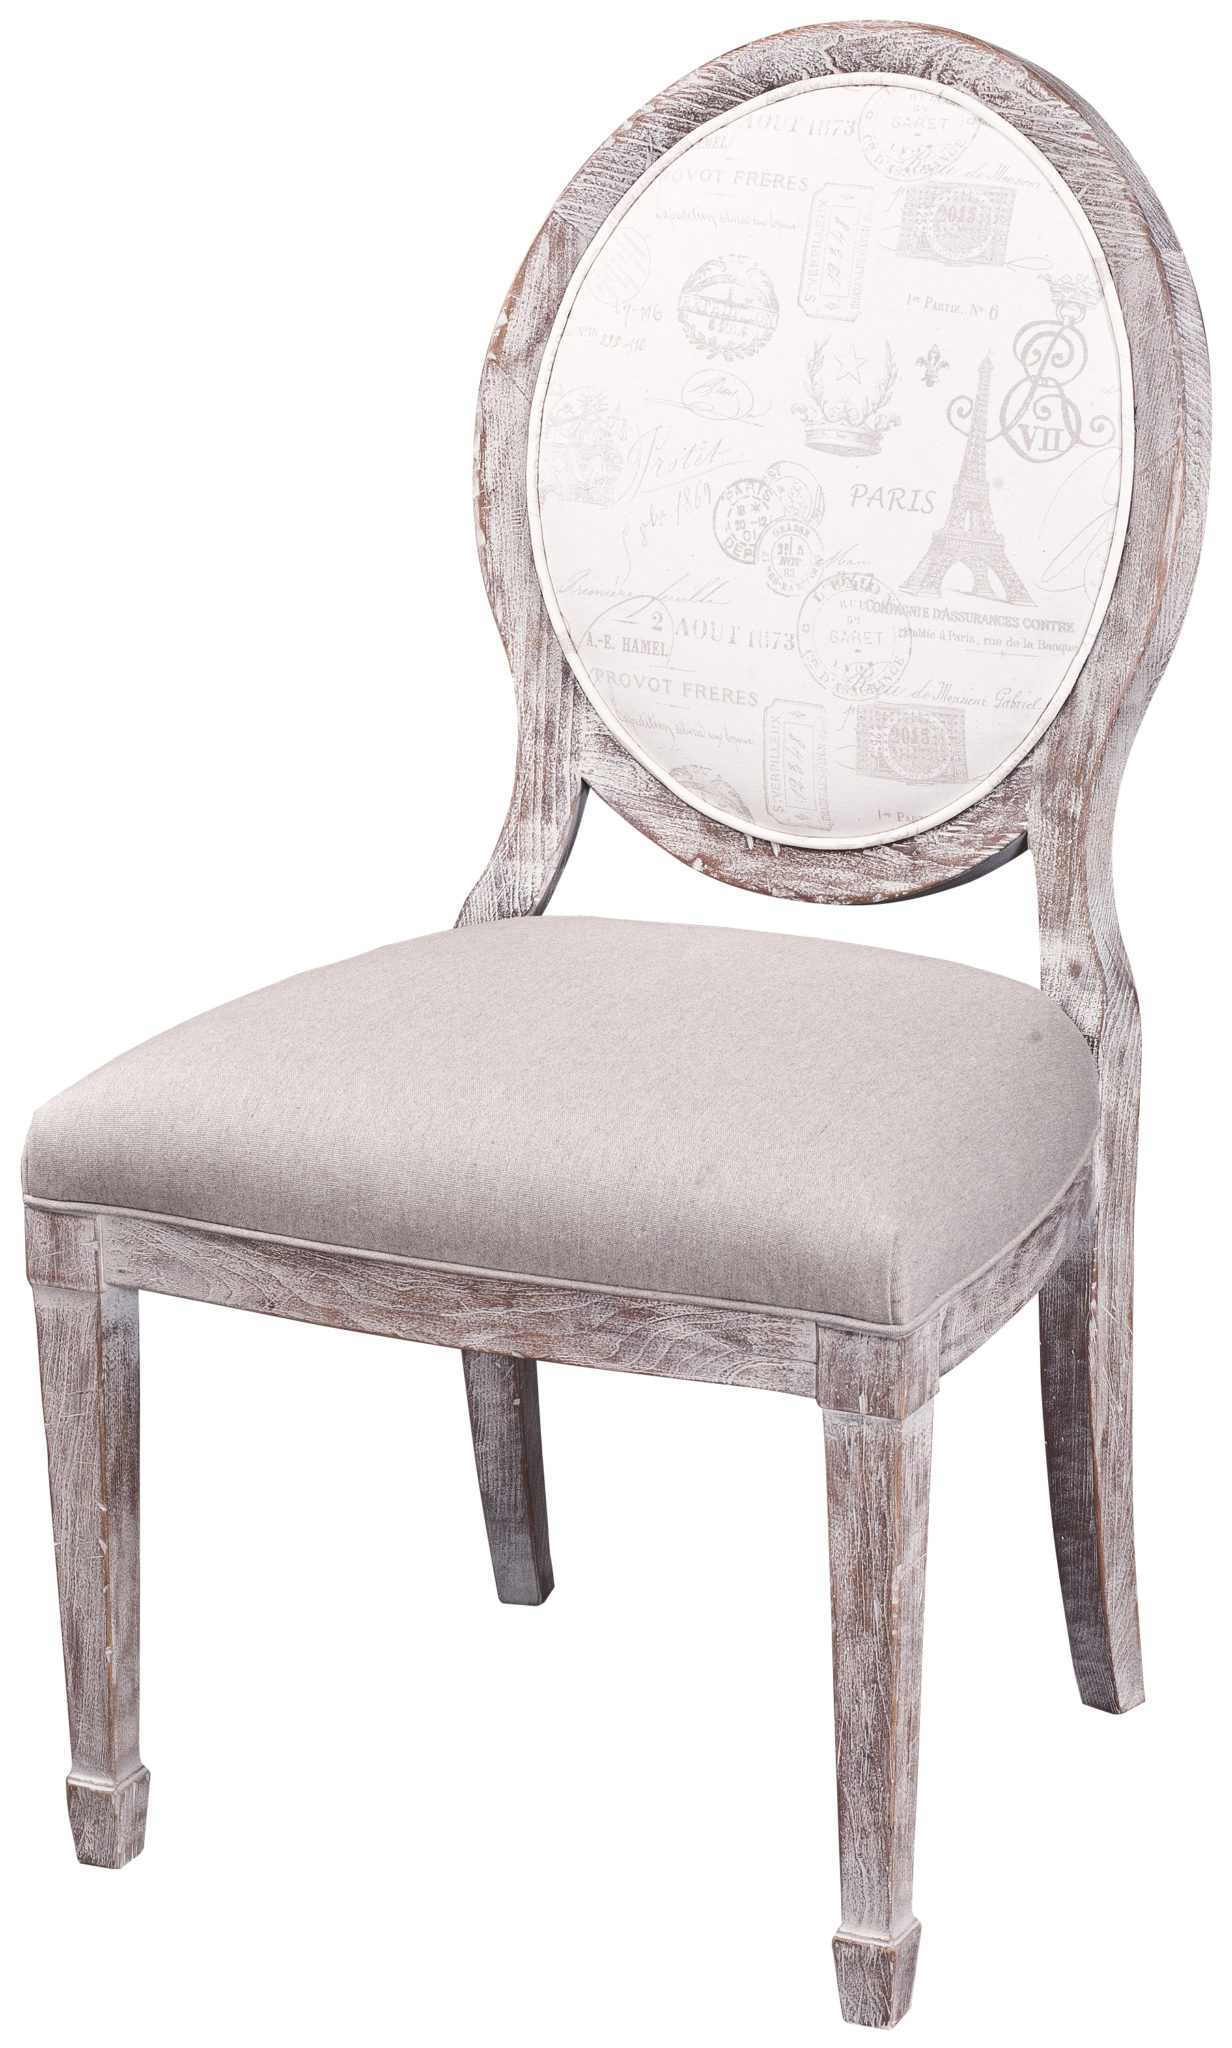 363U-1-Weathered-Side-Bayonne-Chair.jpg